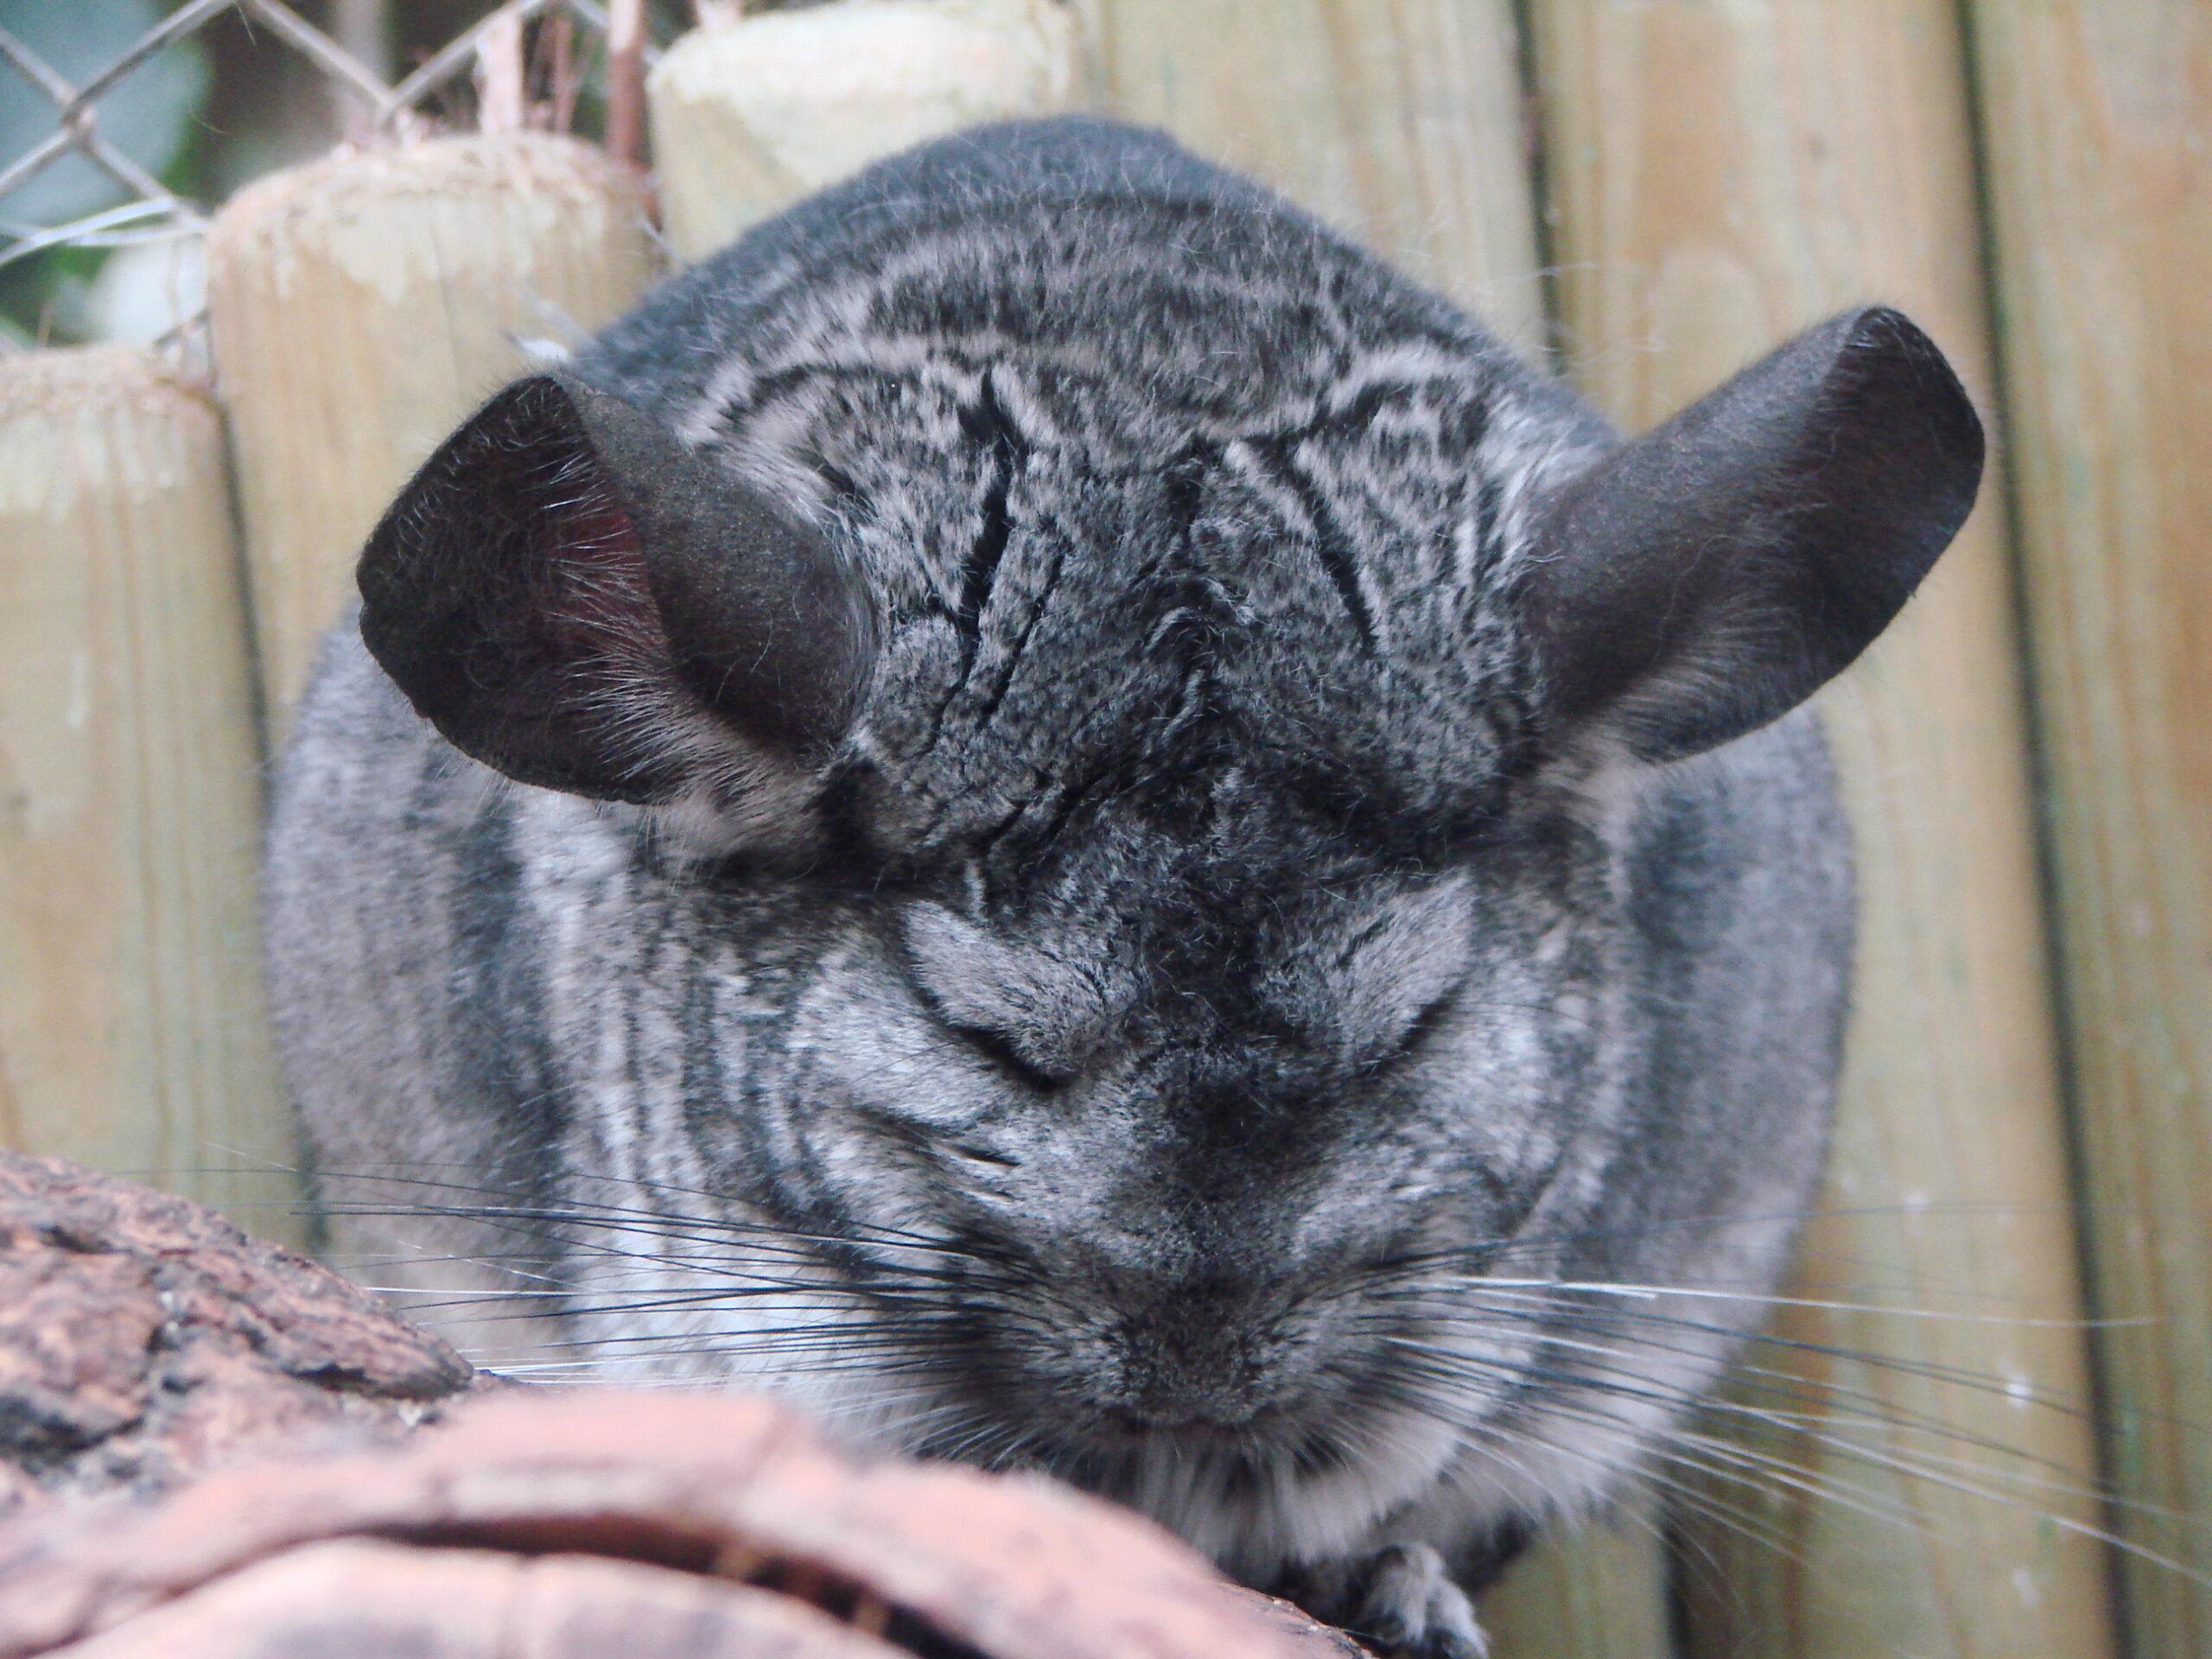 Chinchilla at the Virginia Zoo